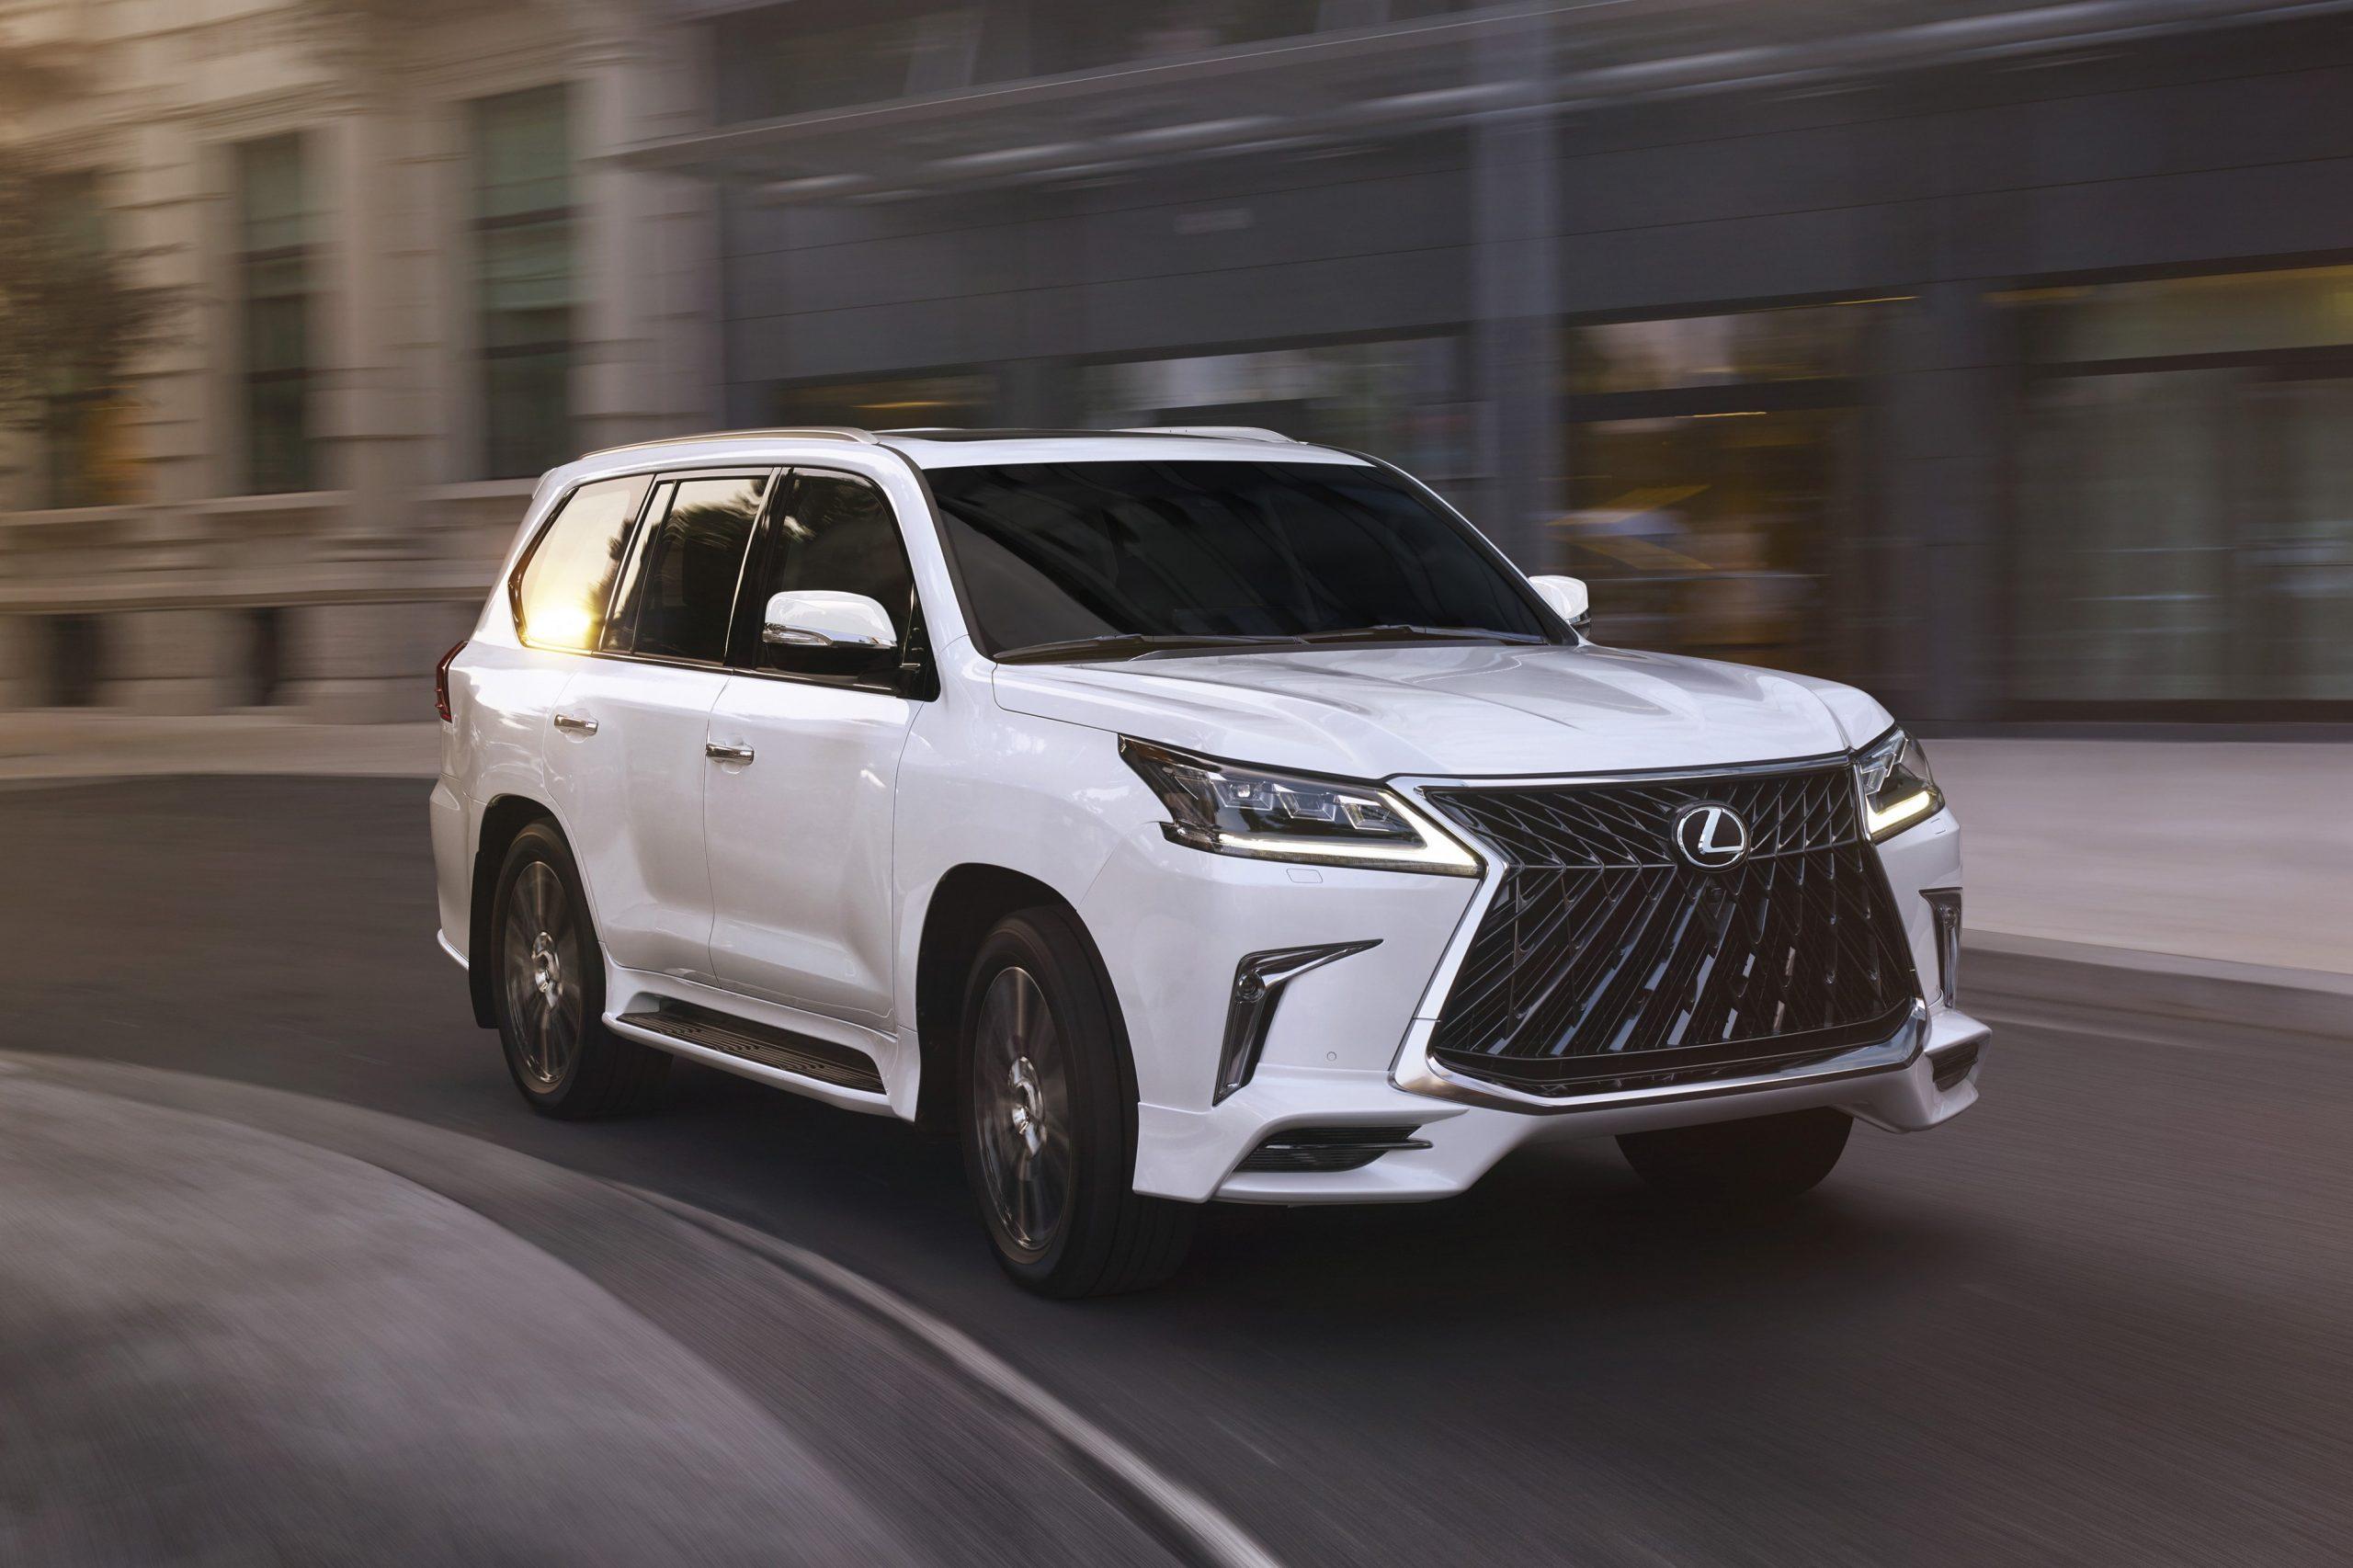 The Next 5 Lexus GX 5, This What We Know So Far!  Cars-Portal